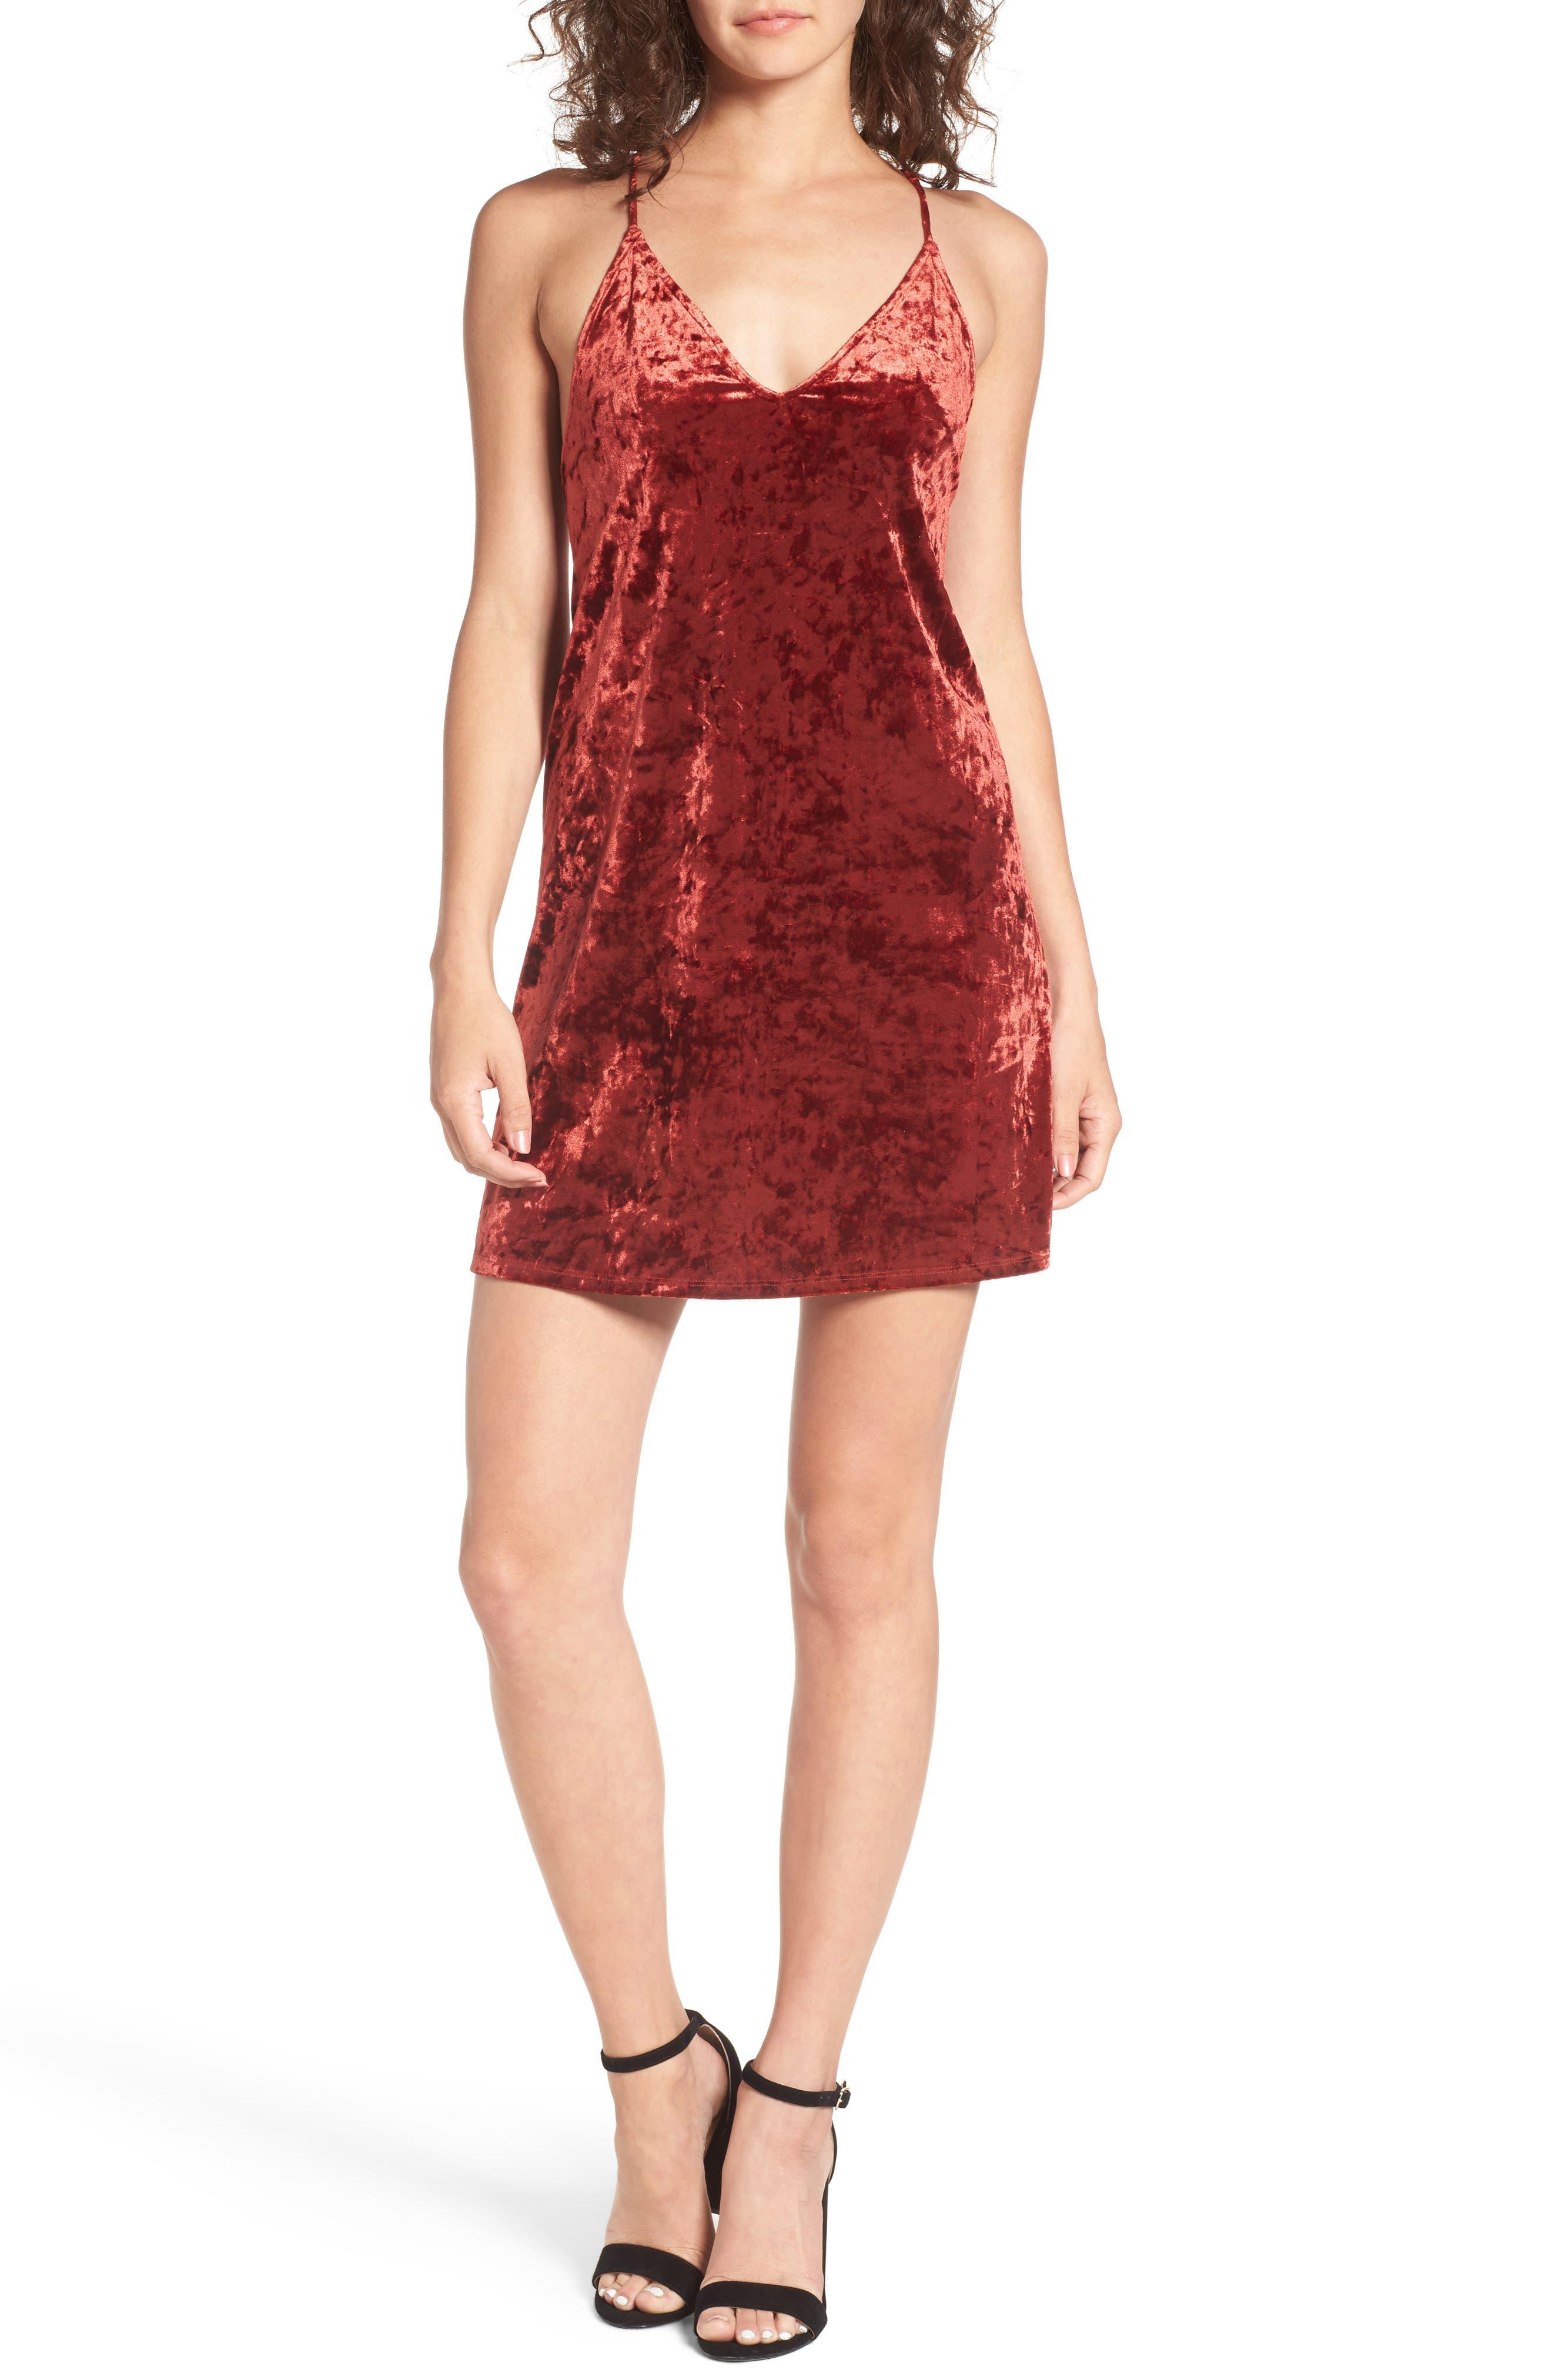 Alternate Image 1 Selected - Privacy Please Raymore Crushed Velvet Minidress